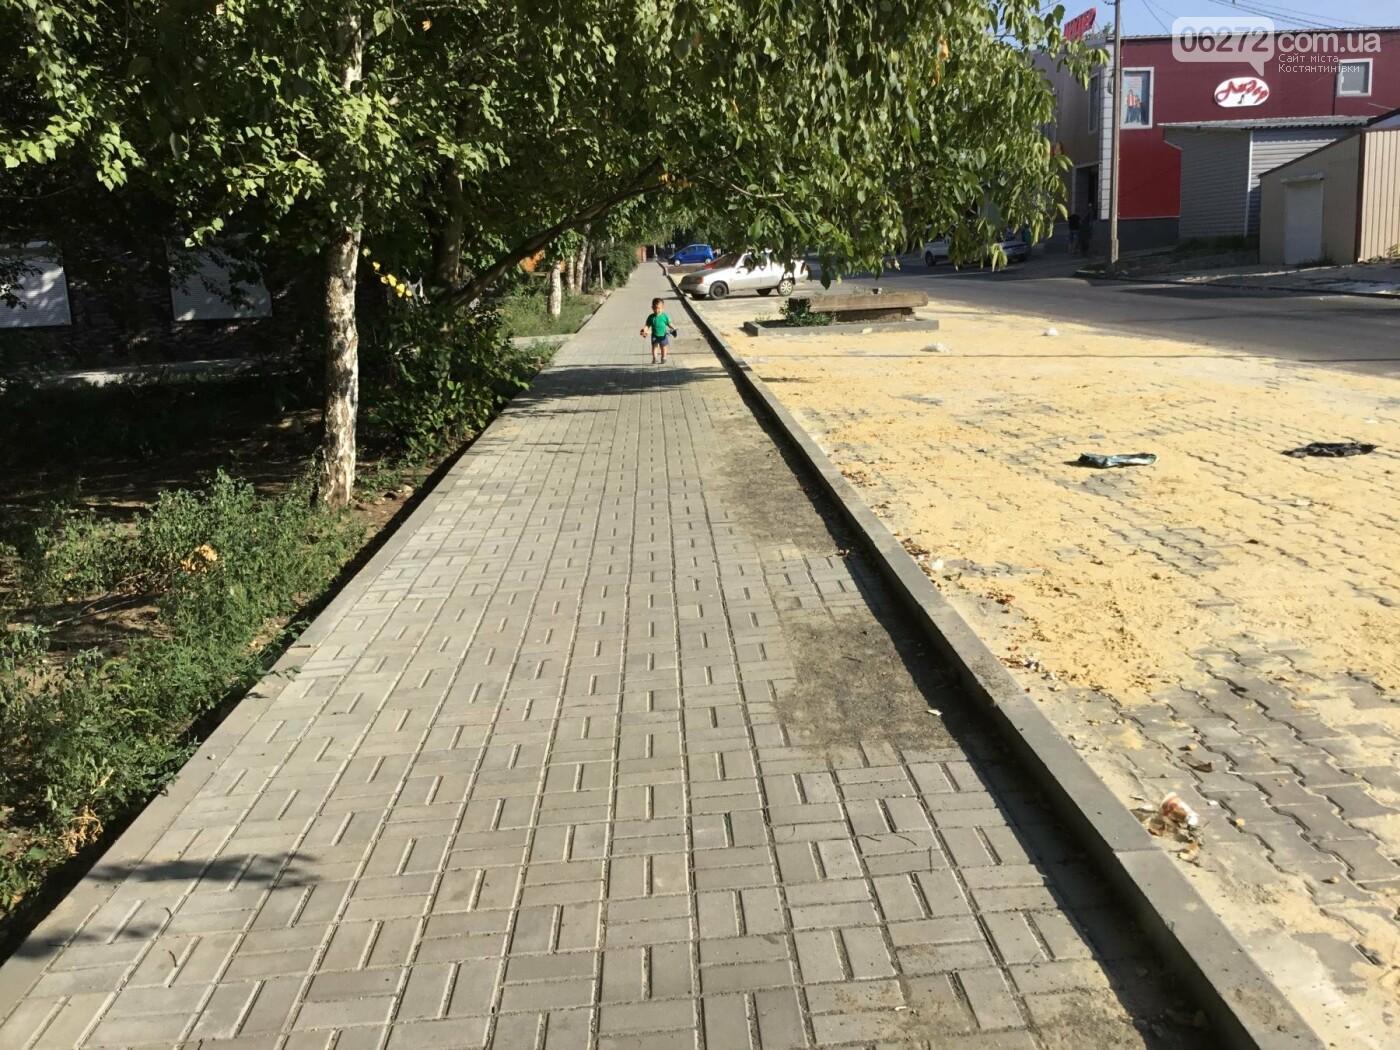 Дорога после ремонта по ул. Леваневского в Константиновке, фото-20